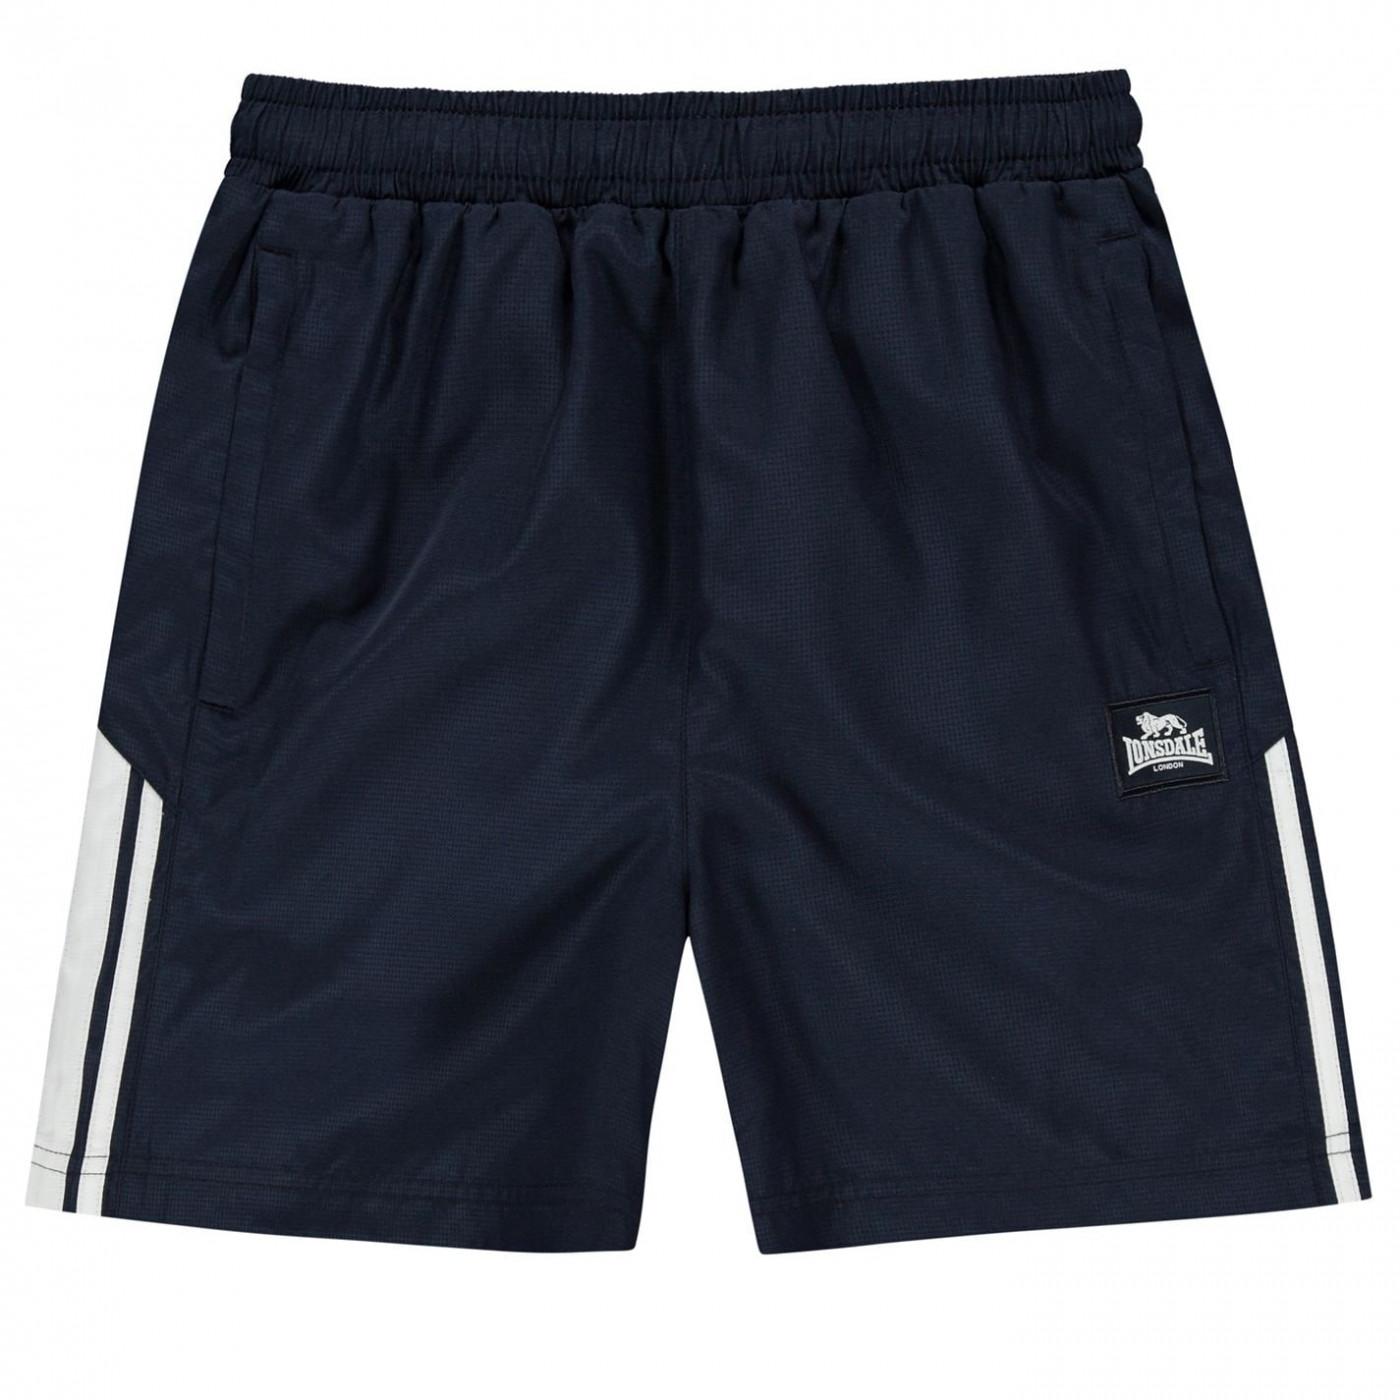 Junior Boys shorts Nike 2 stripe